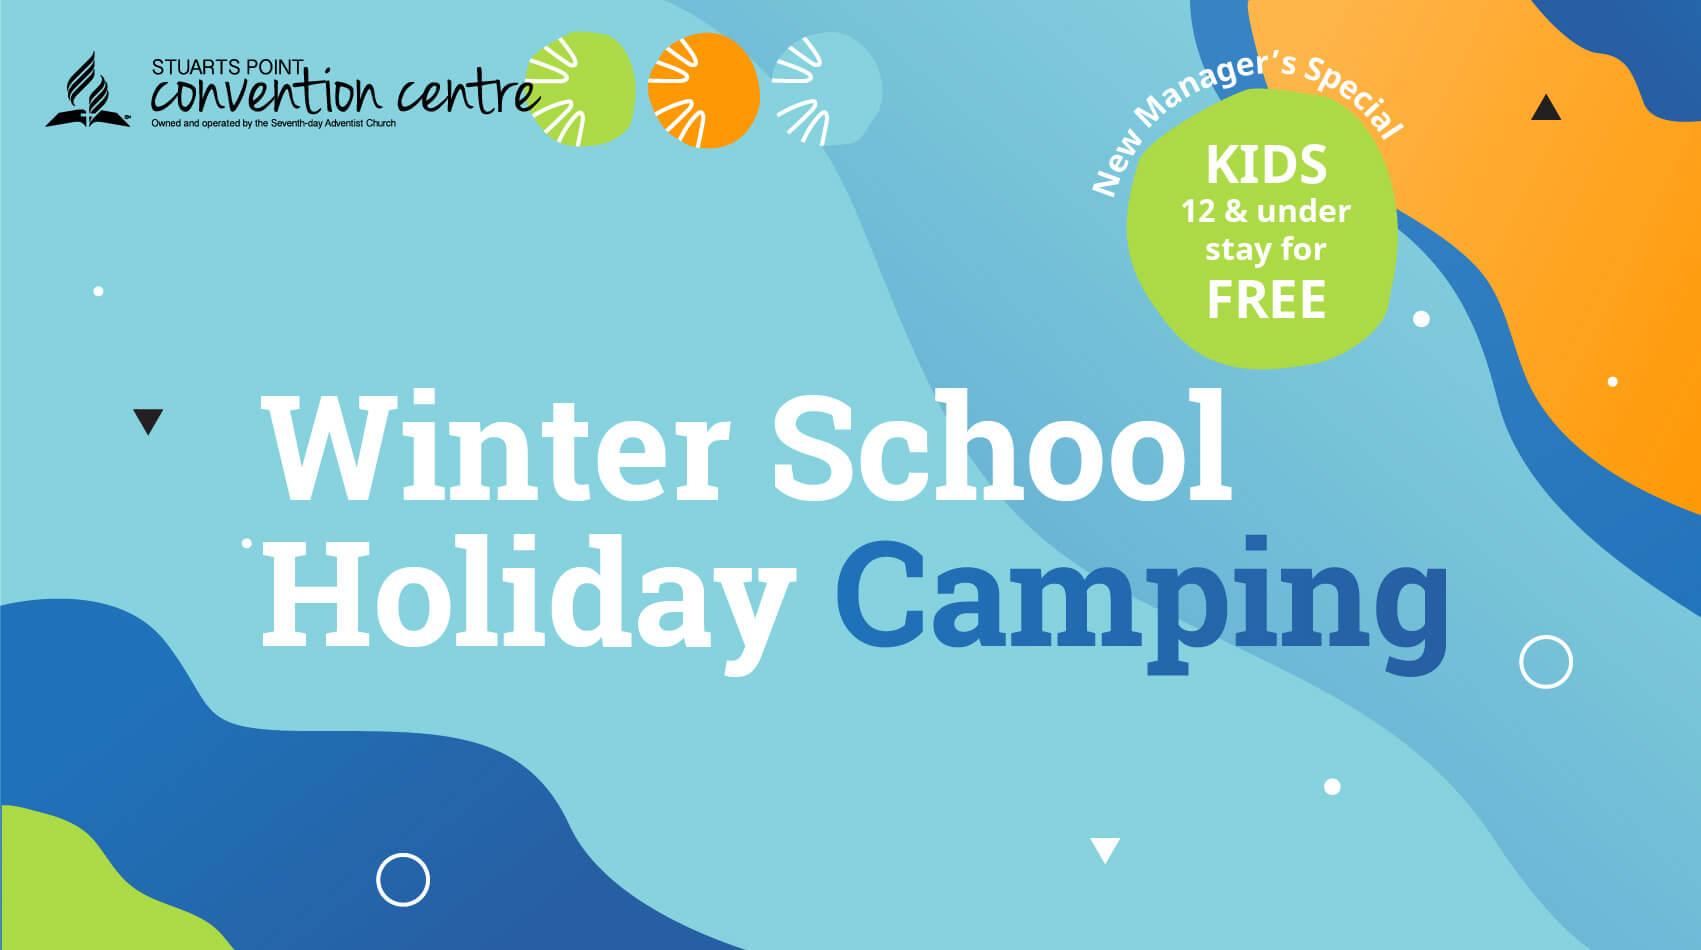 Winter School Holiday Camping